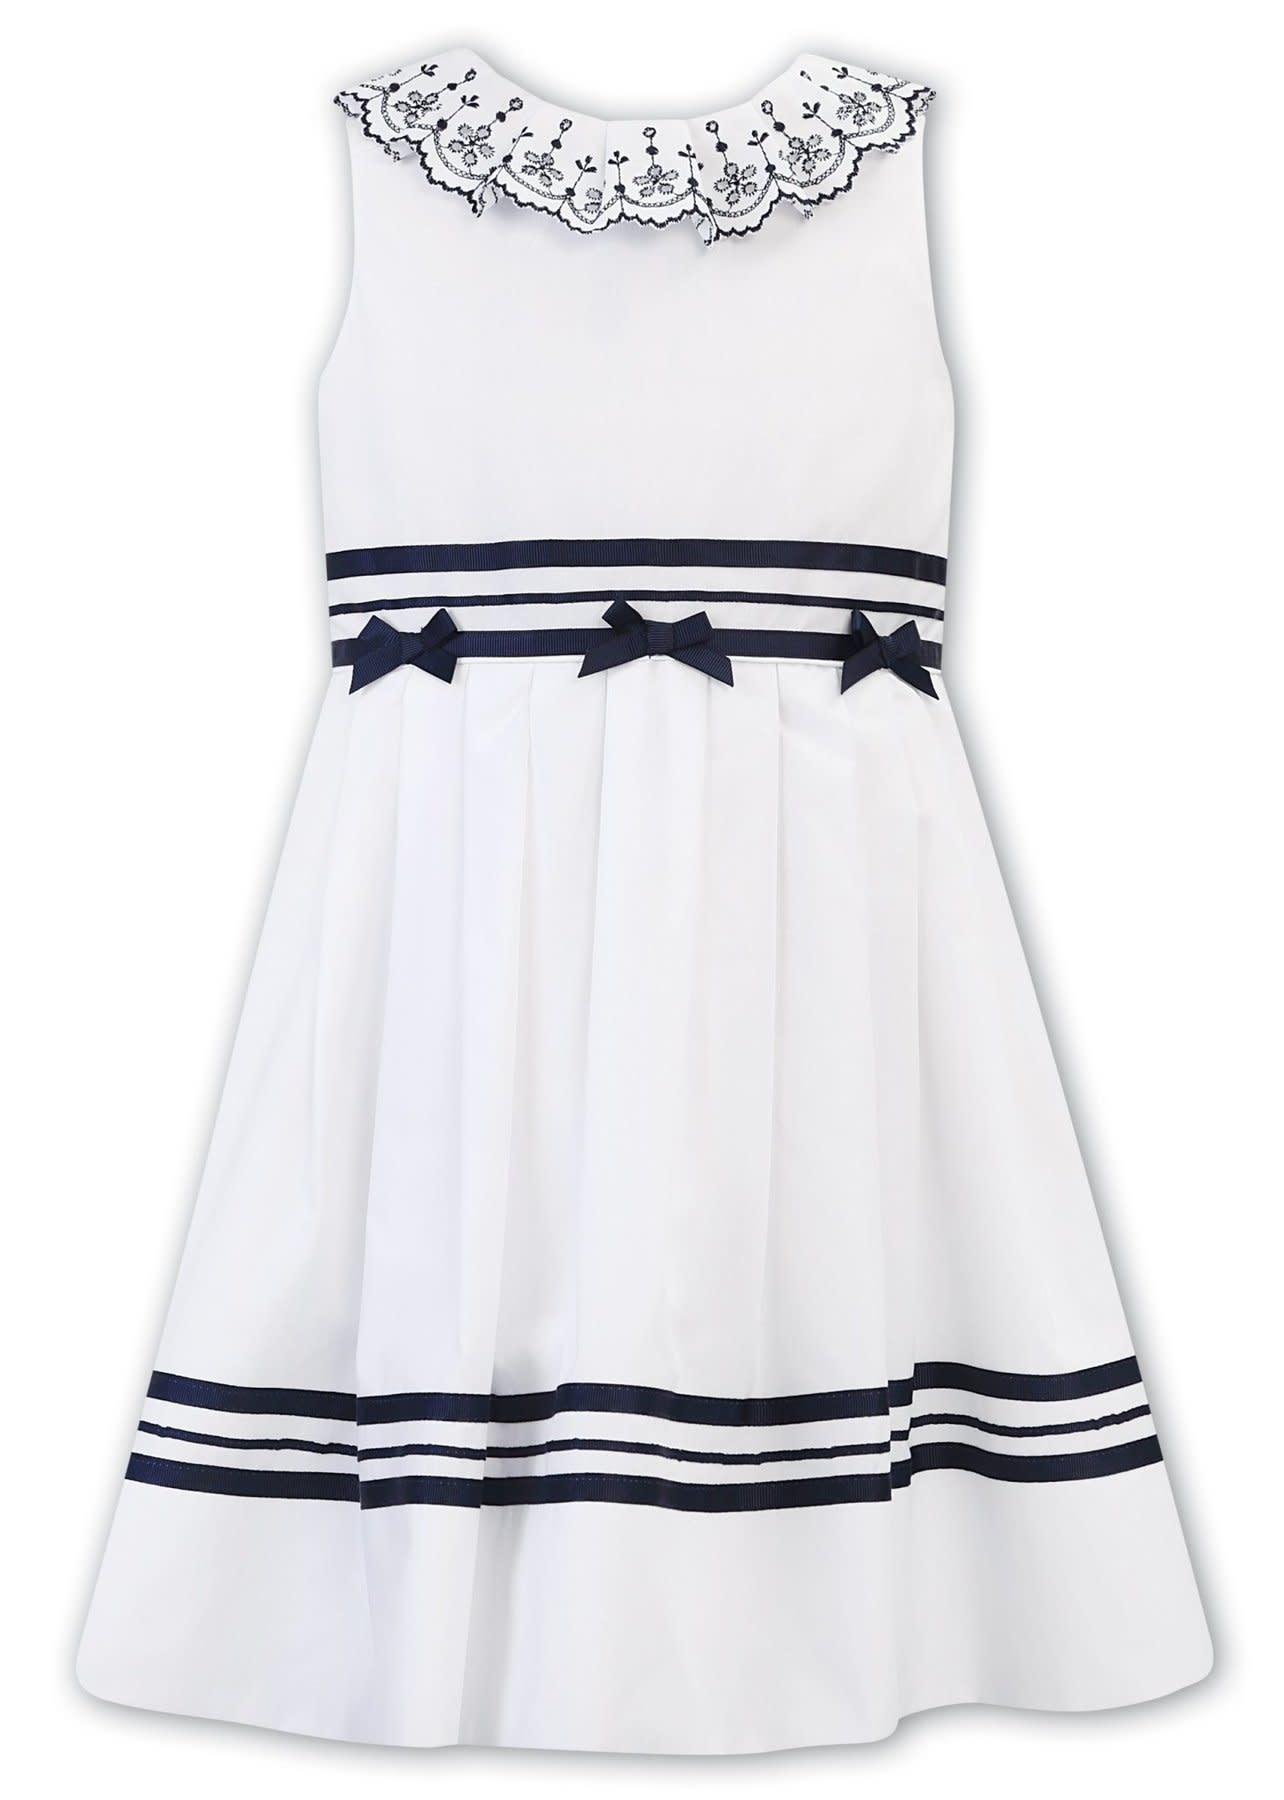 Sarah Louise Sarah Louise 011883 White & Navy Dress with 3 Bows